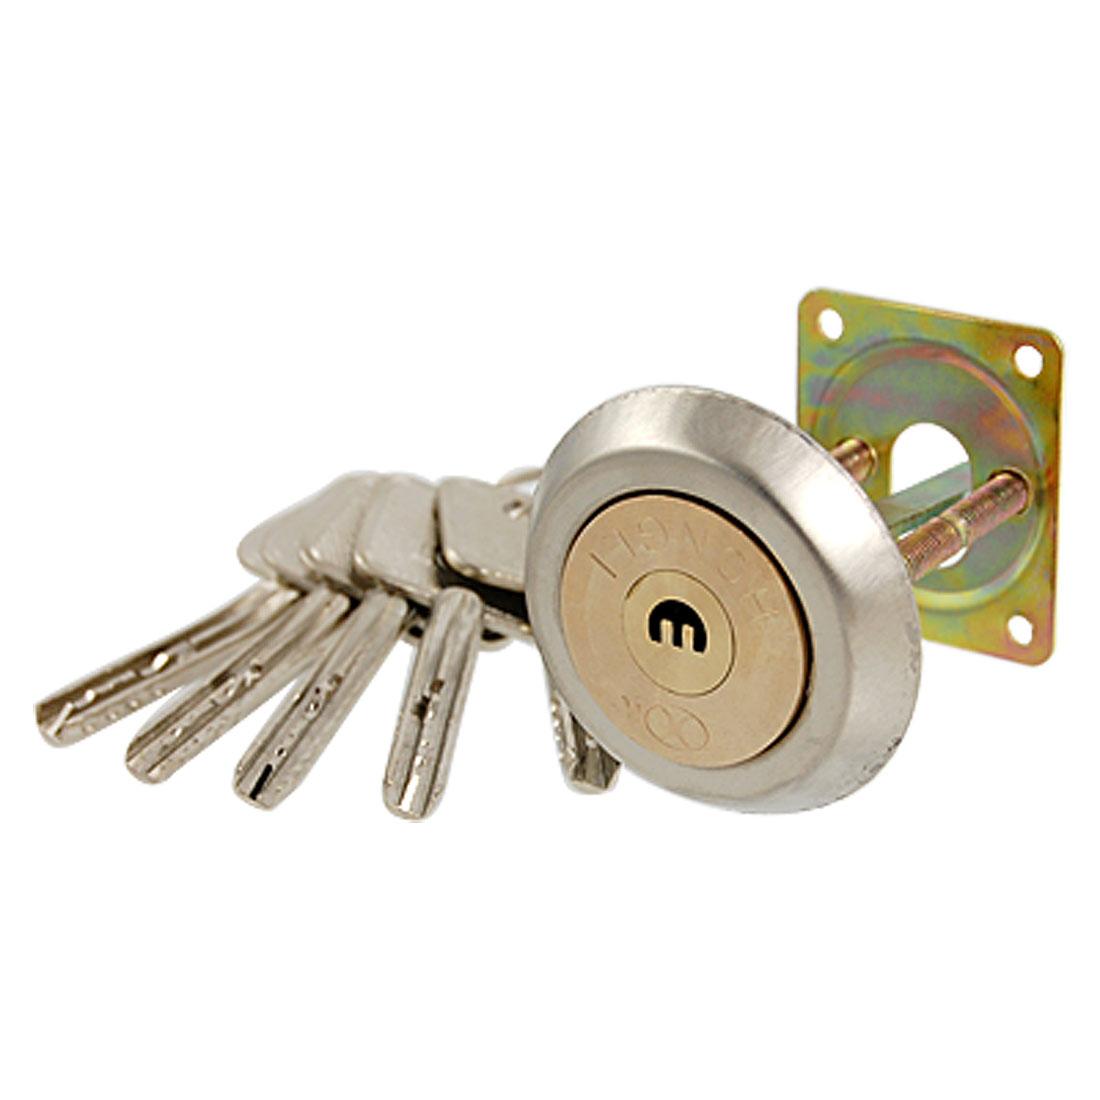 Cabinets Gates Brass Tone E Keyhole Tapered Ned Doors Lock Set